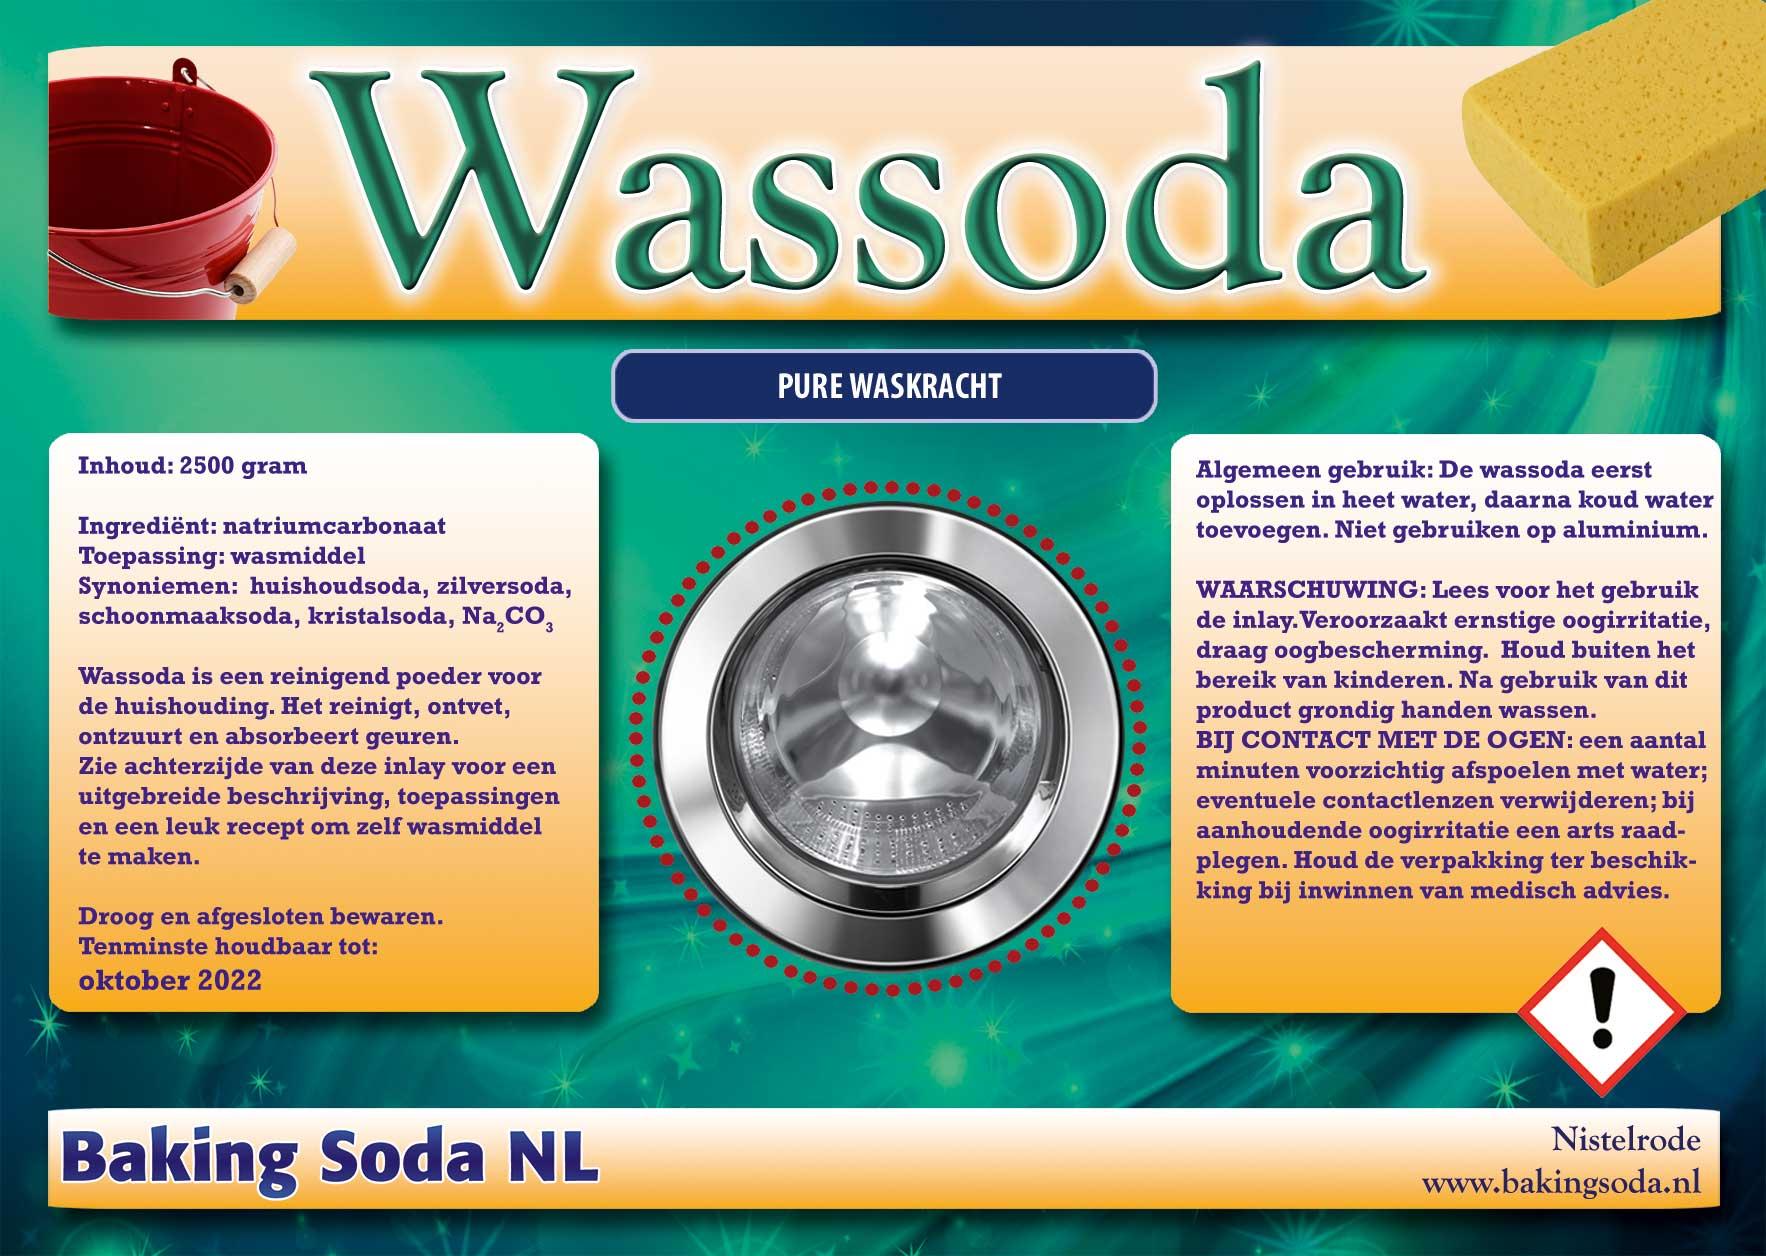 Wassoda